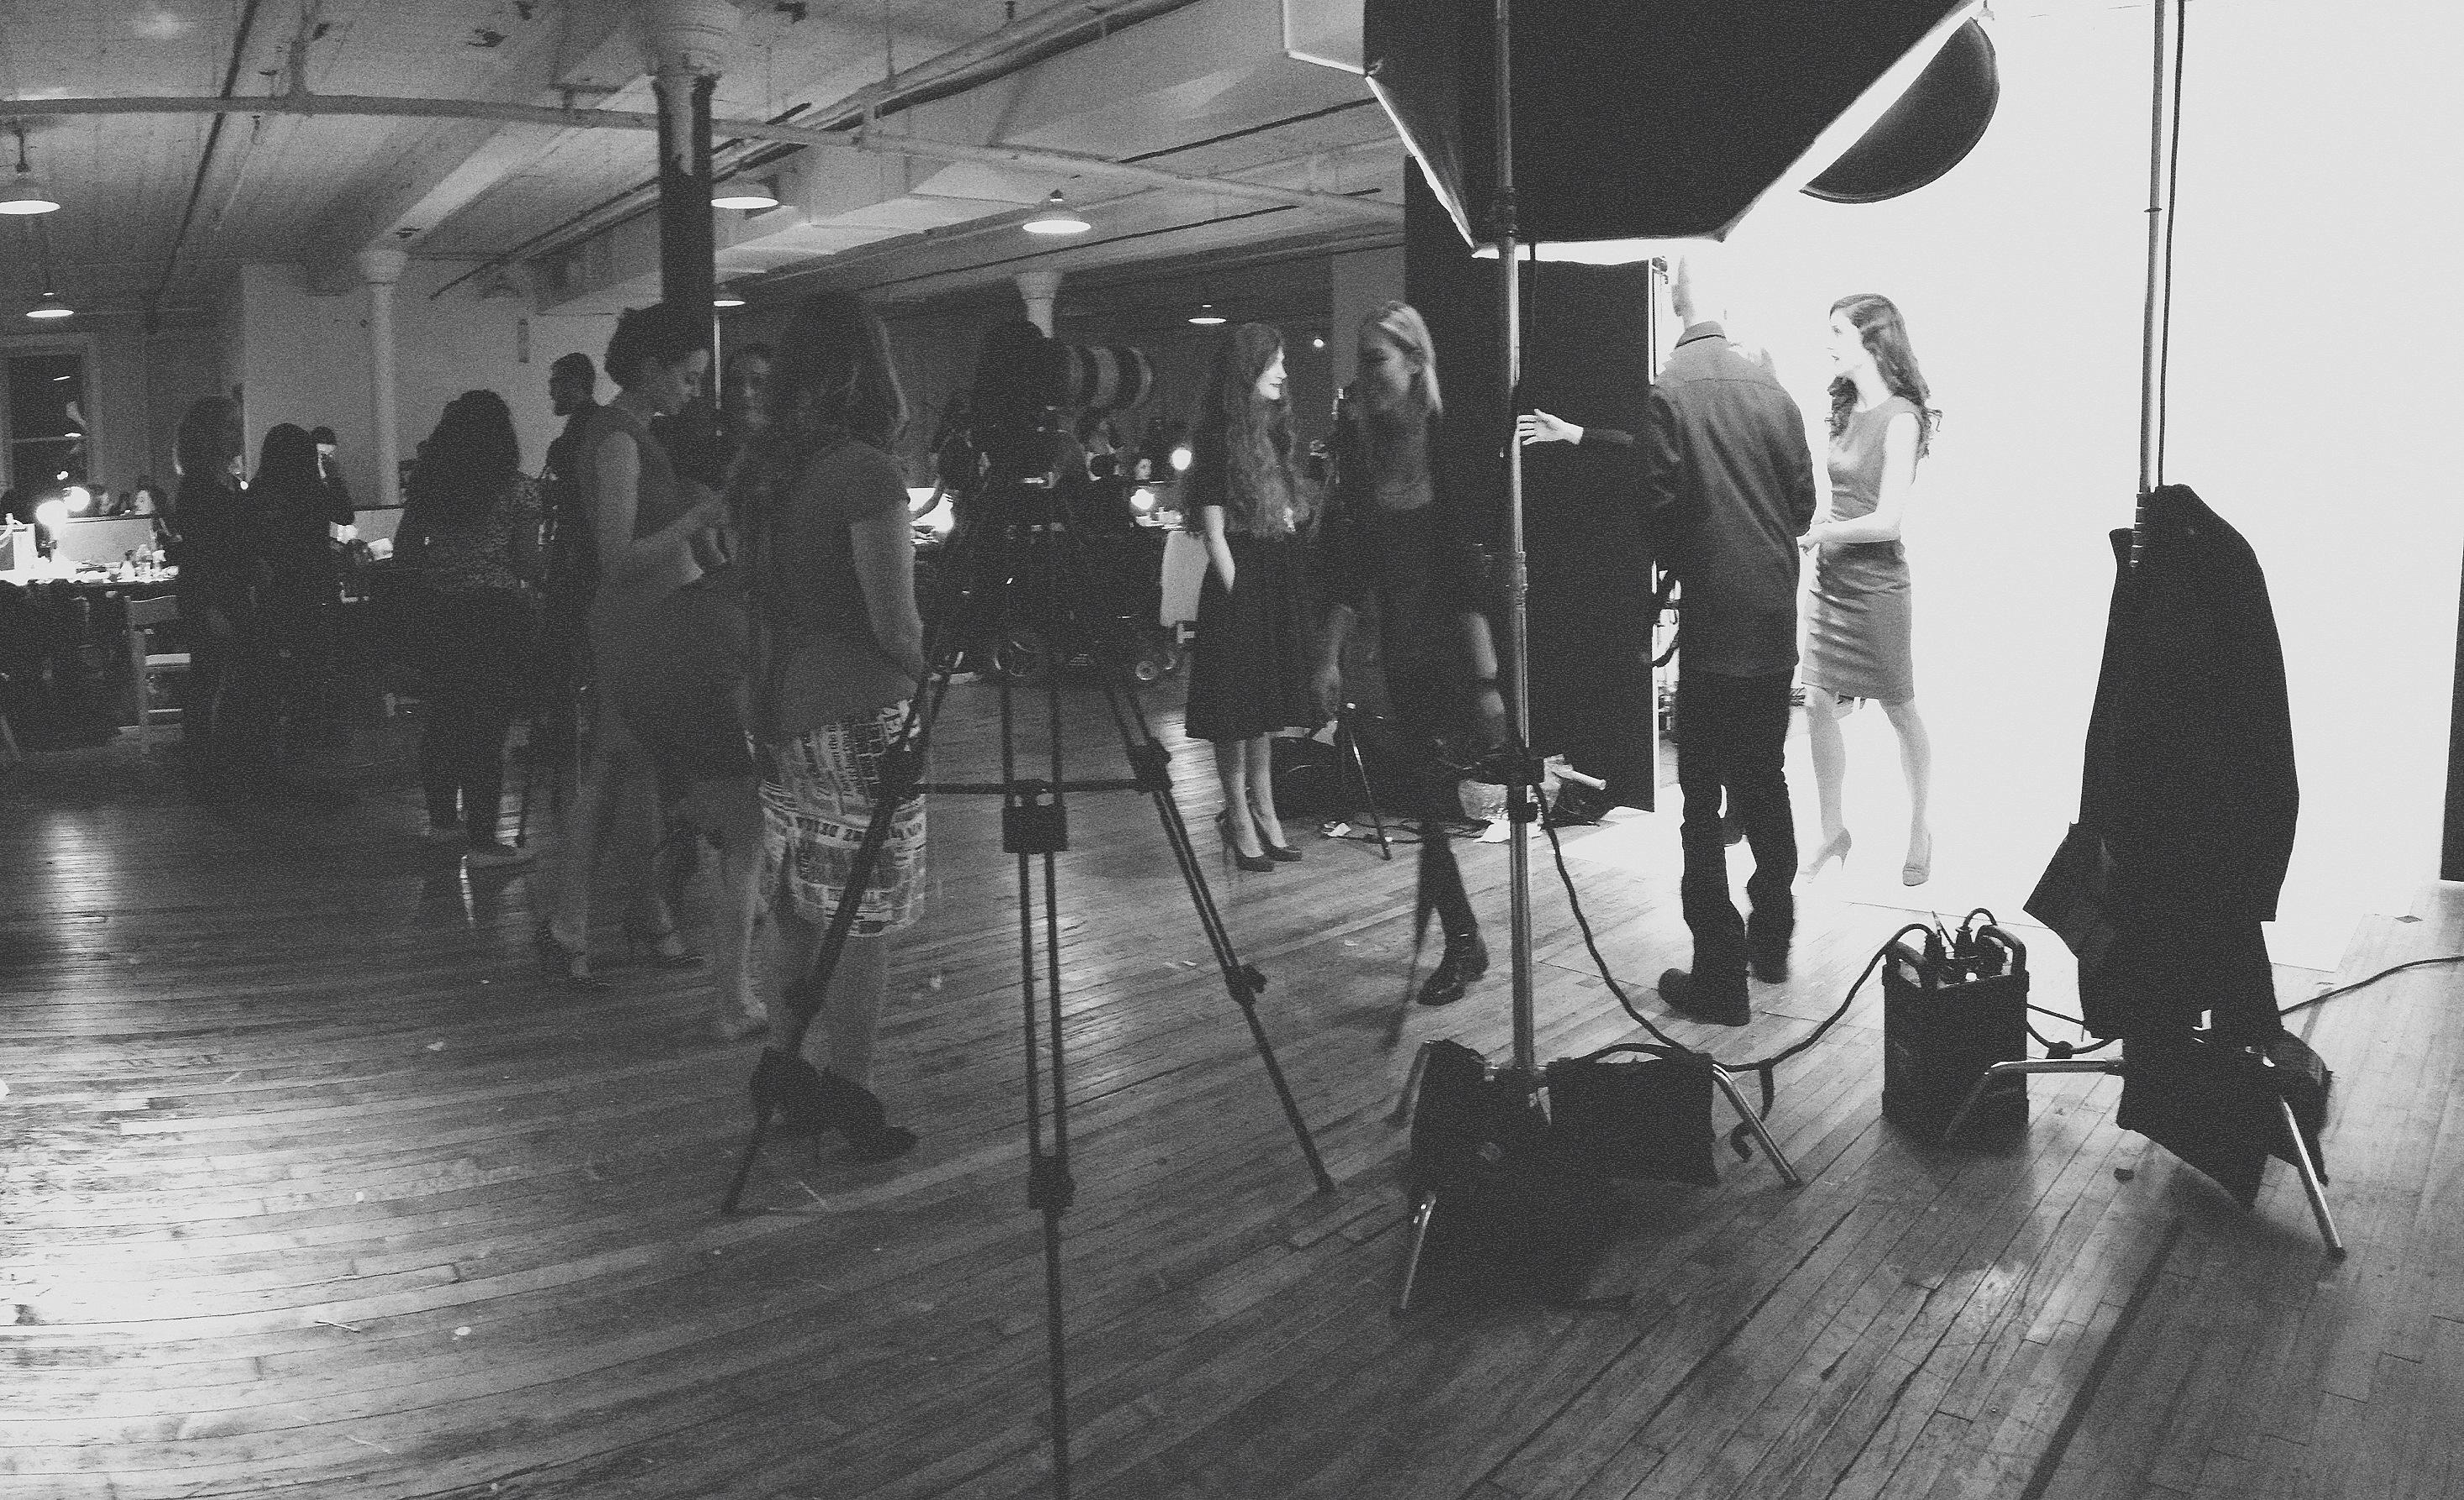 Launch-NYC, Adorama, Pro, Manufacture-NY, NYFW, Fashion-Week, runway, photography, show, press-lounge